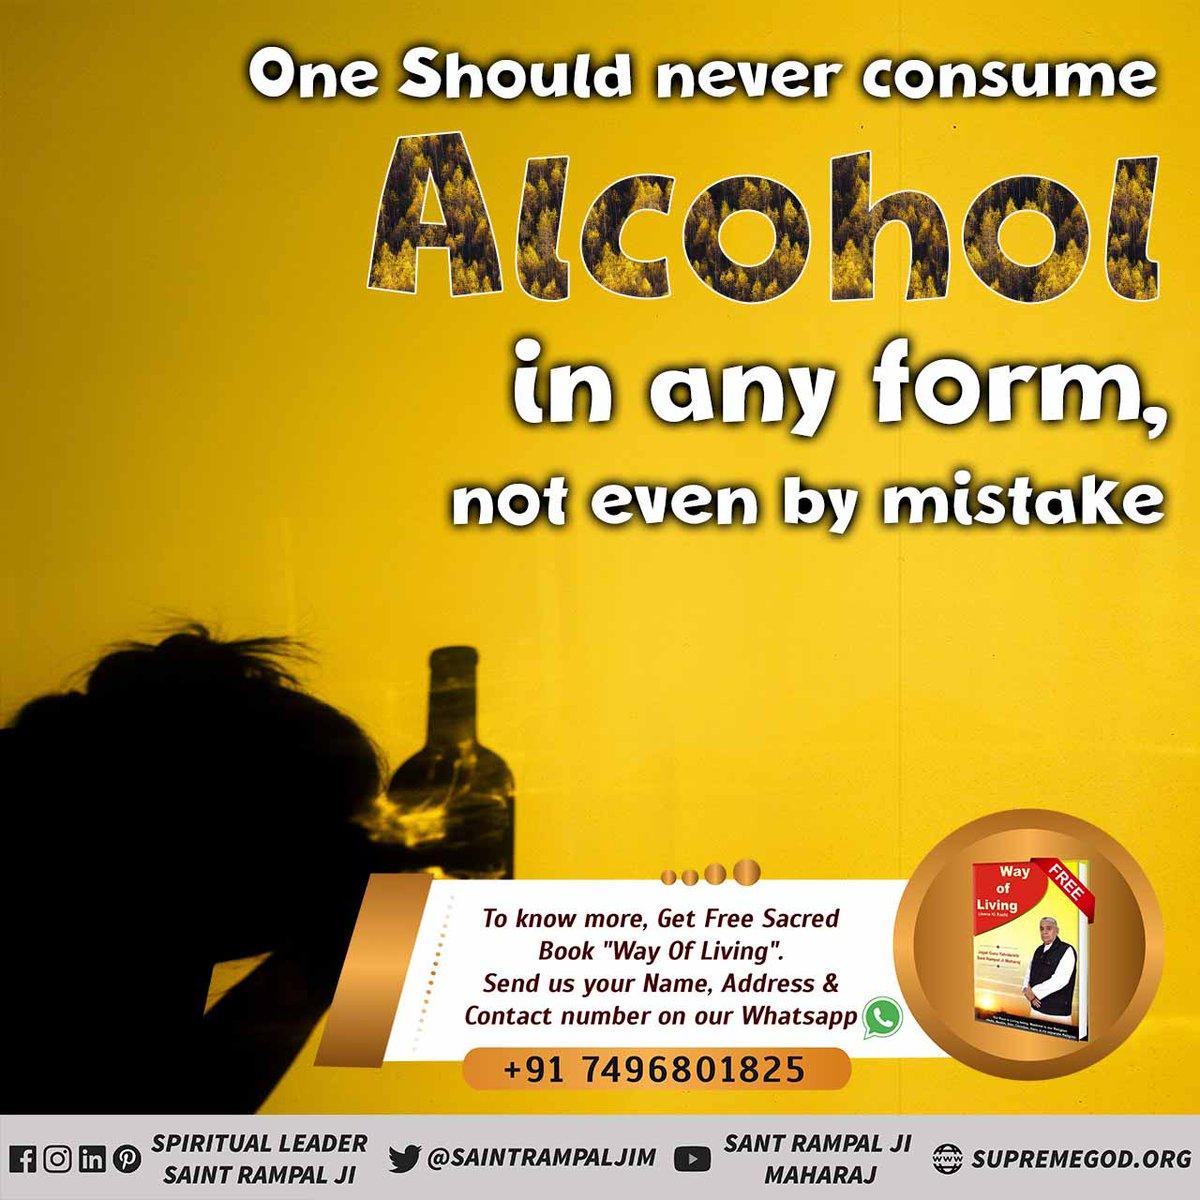 #GodMorningThursday Stop drinking wine. More information please visit for satlok ashram youtube channel . Must watching sadhna TV at 7:30pm @Aarya00T  @SatlokChannel  @KingSalman  @anantgoenka  @arya_offl @ABPNews https://t.co/Btn8soPblM